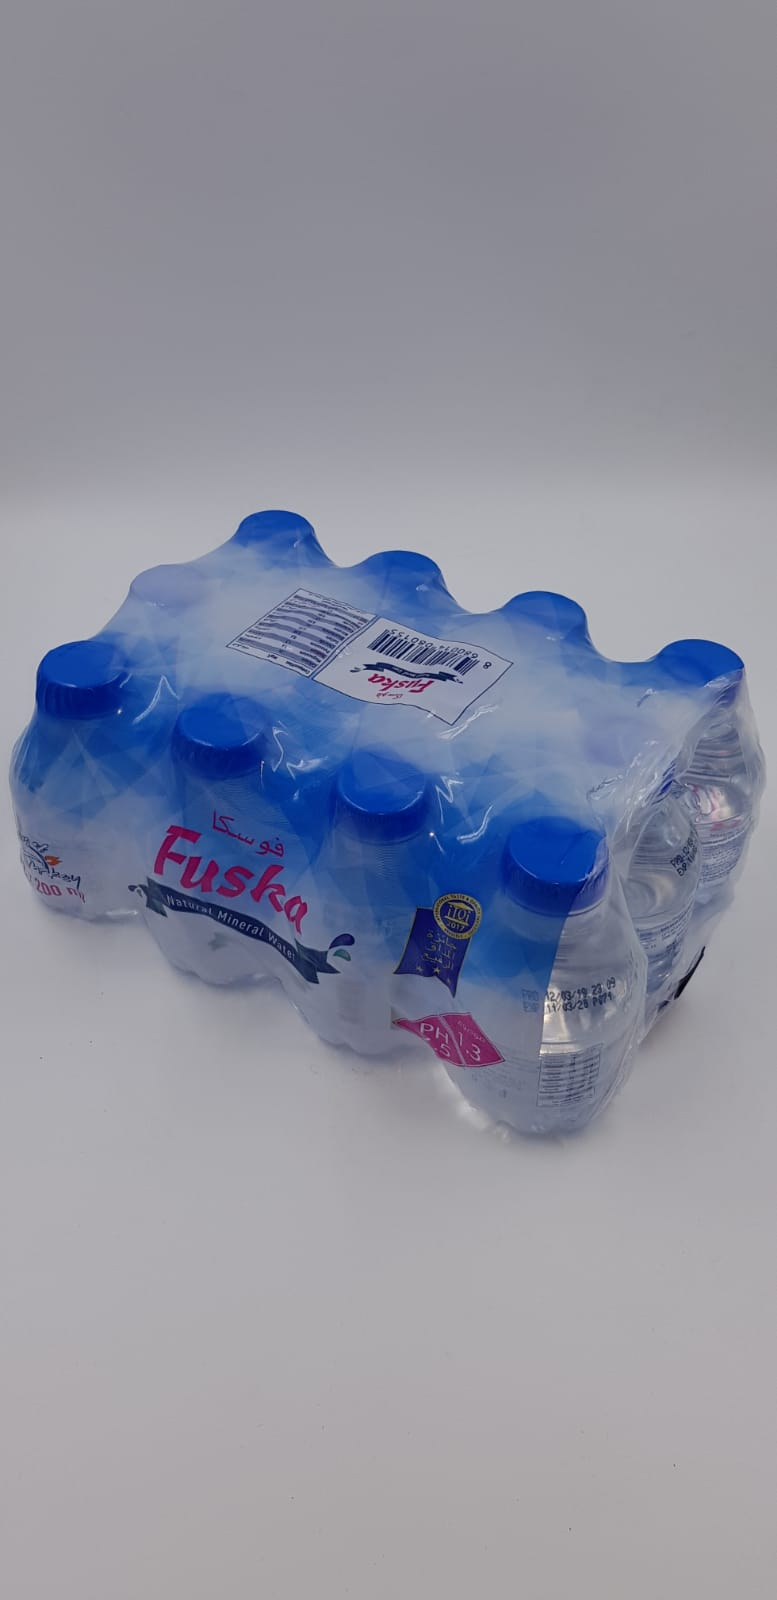 FUSKA DRINKING WATER 12 x 200ML